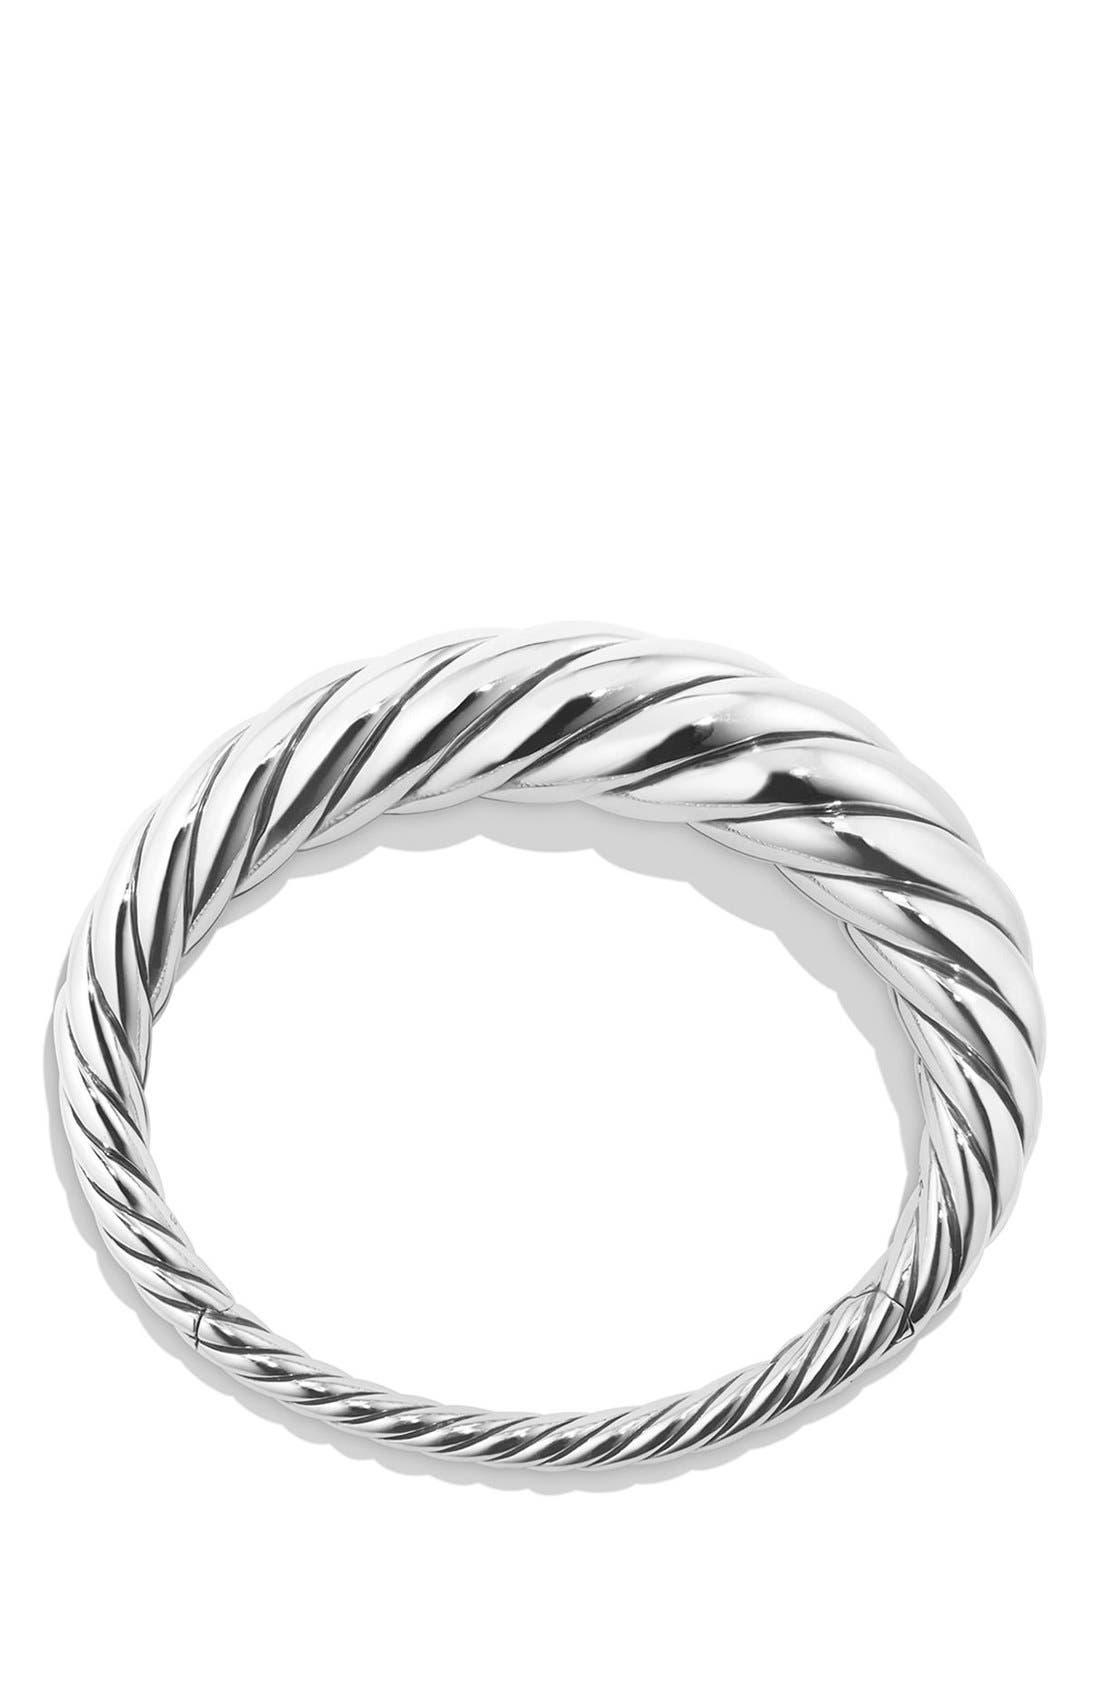 Alternate Image 2  - David Yurman 'Pure Form' Cable Bracelet